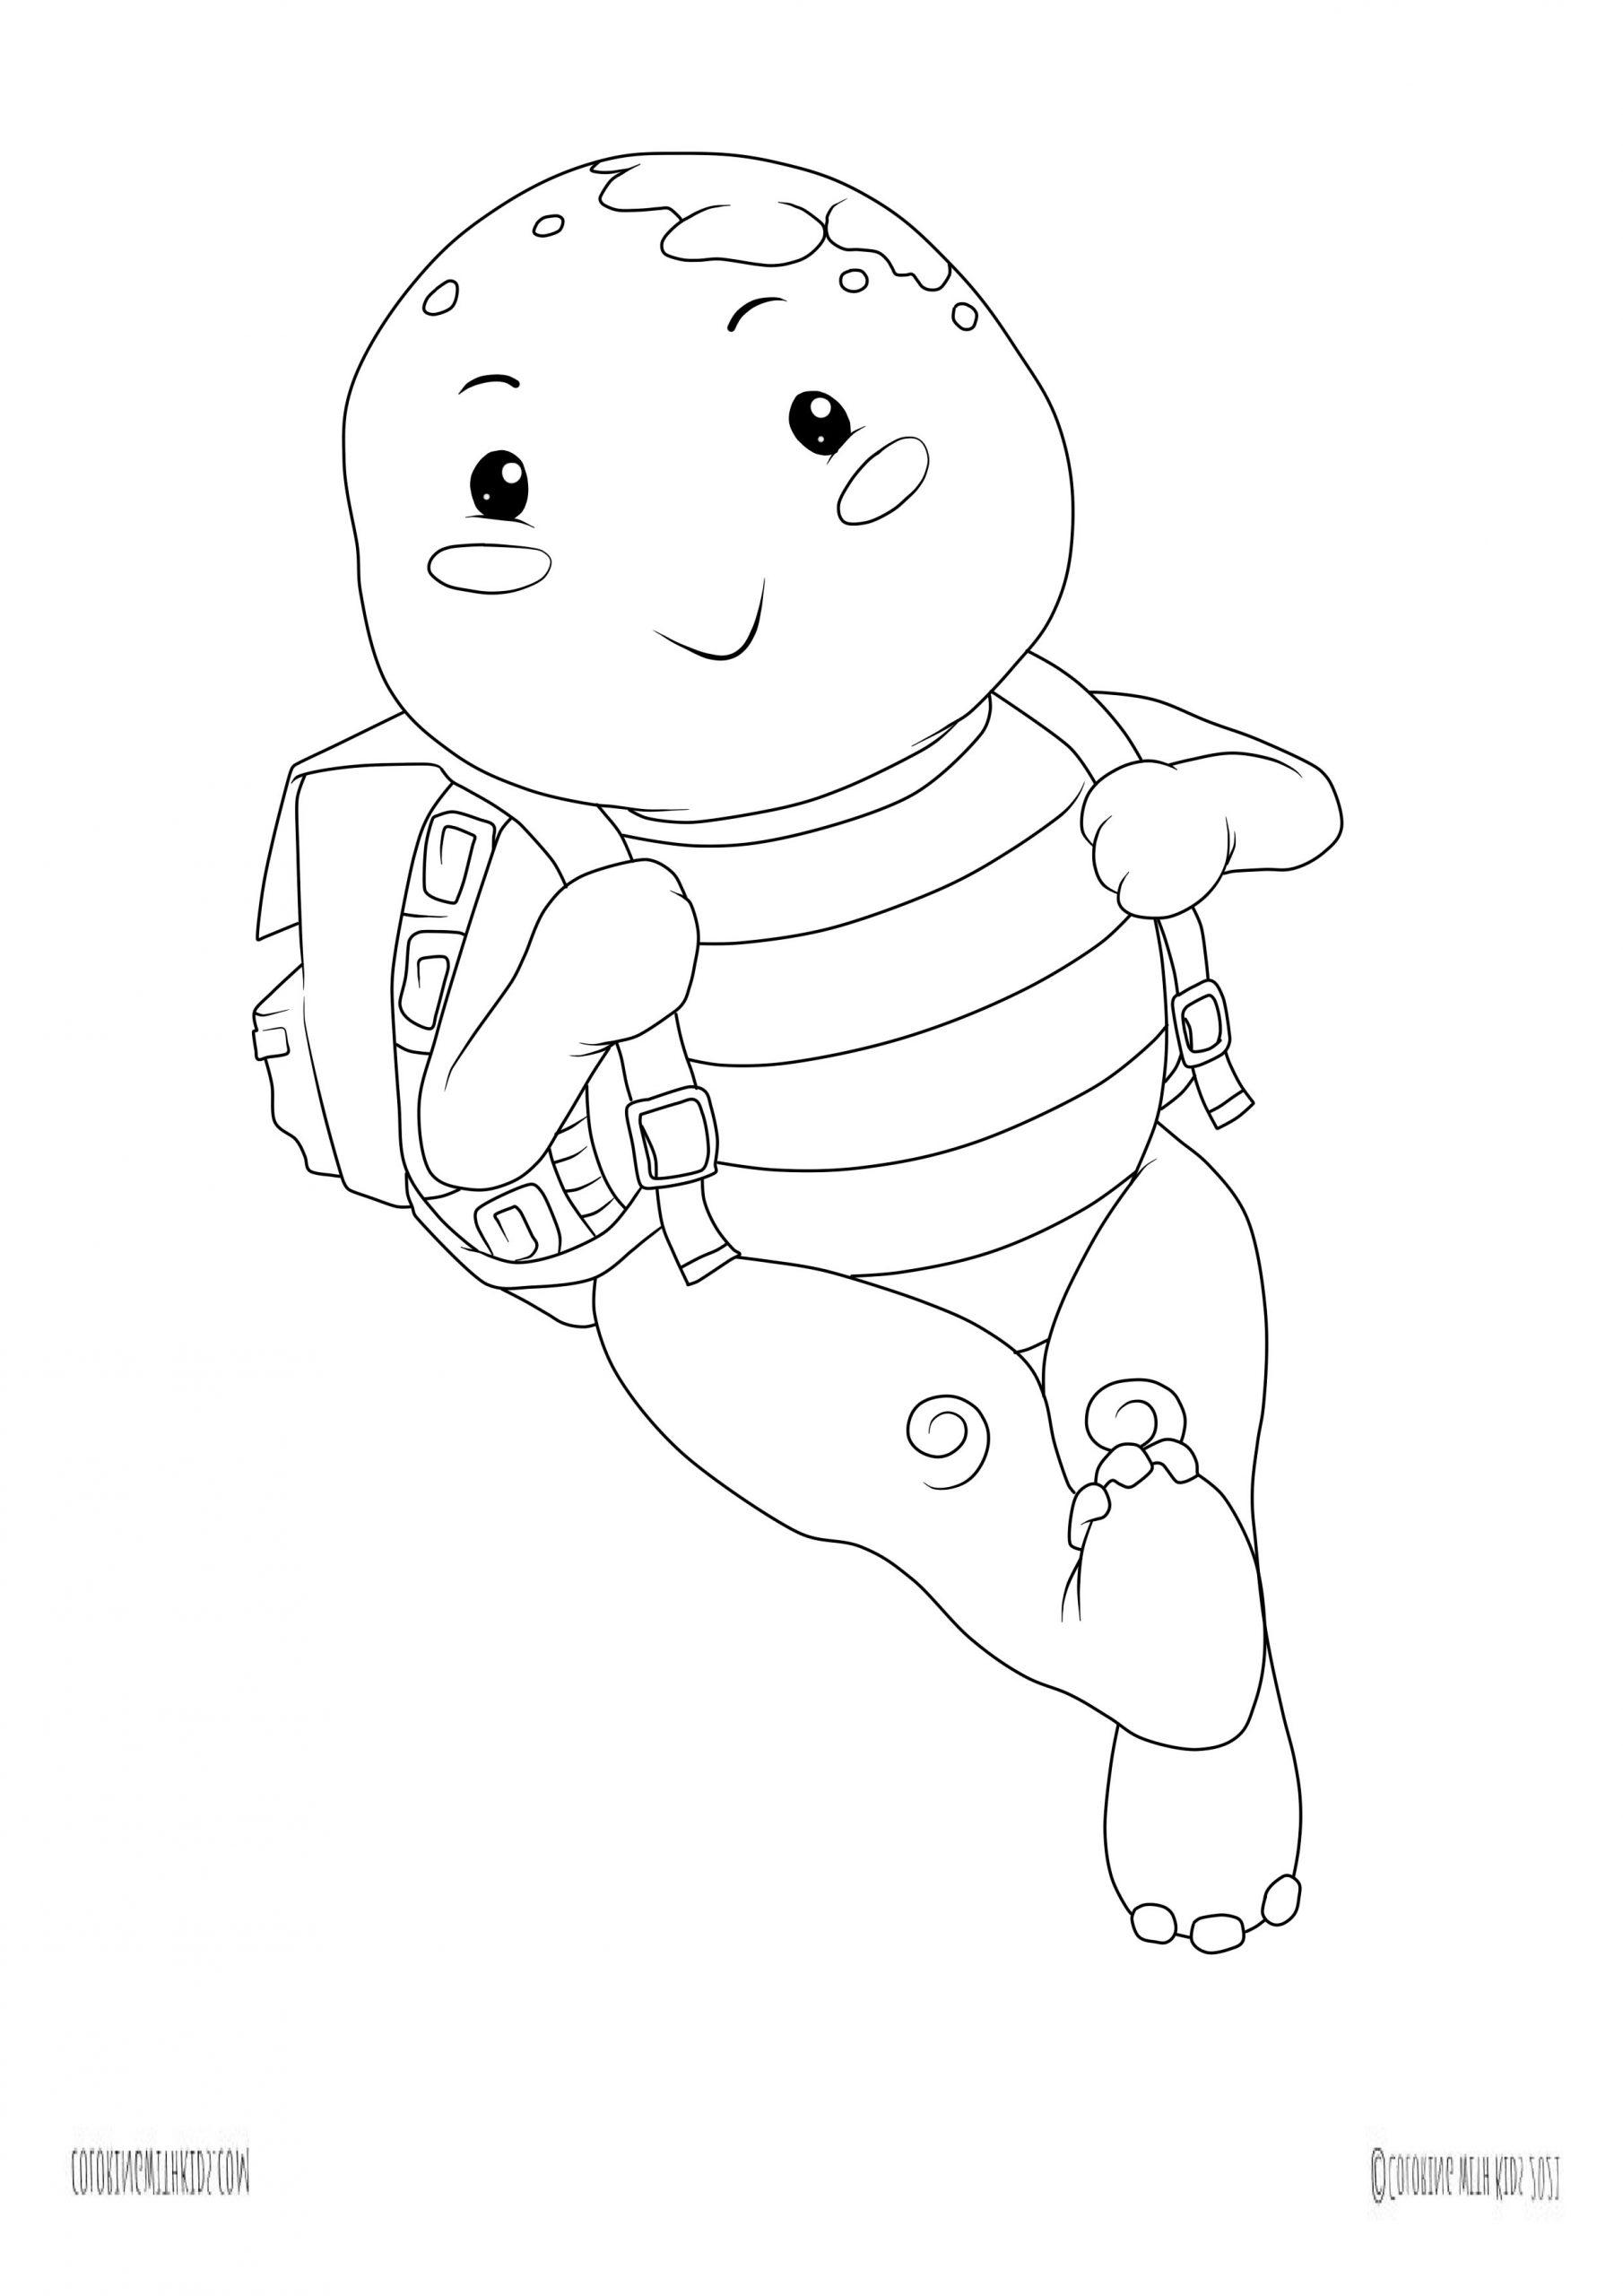 Kawaii Turtle Coloring page